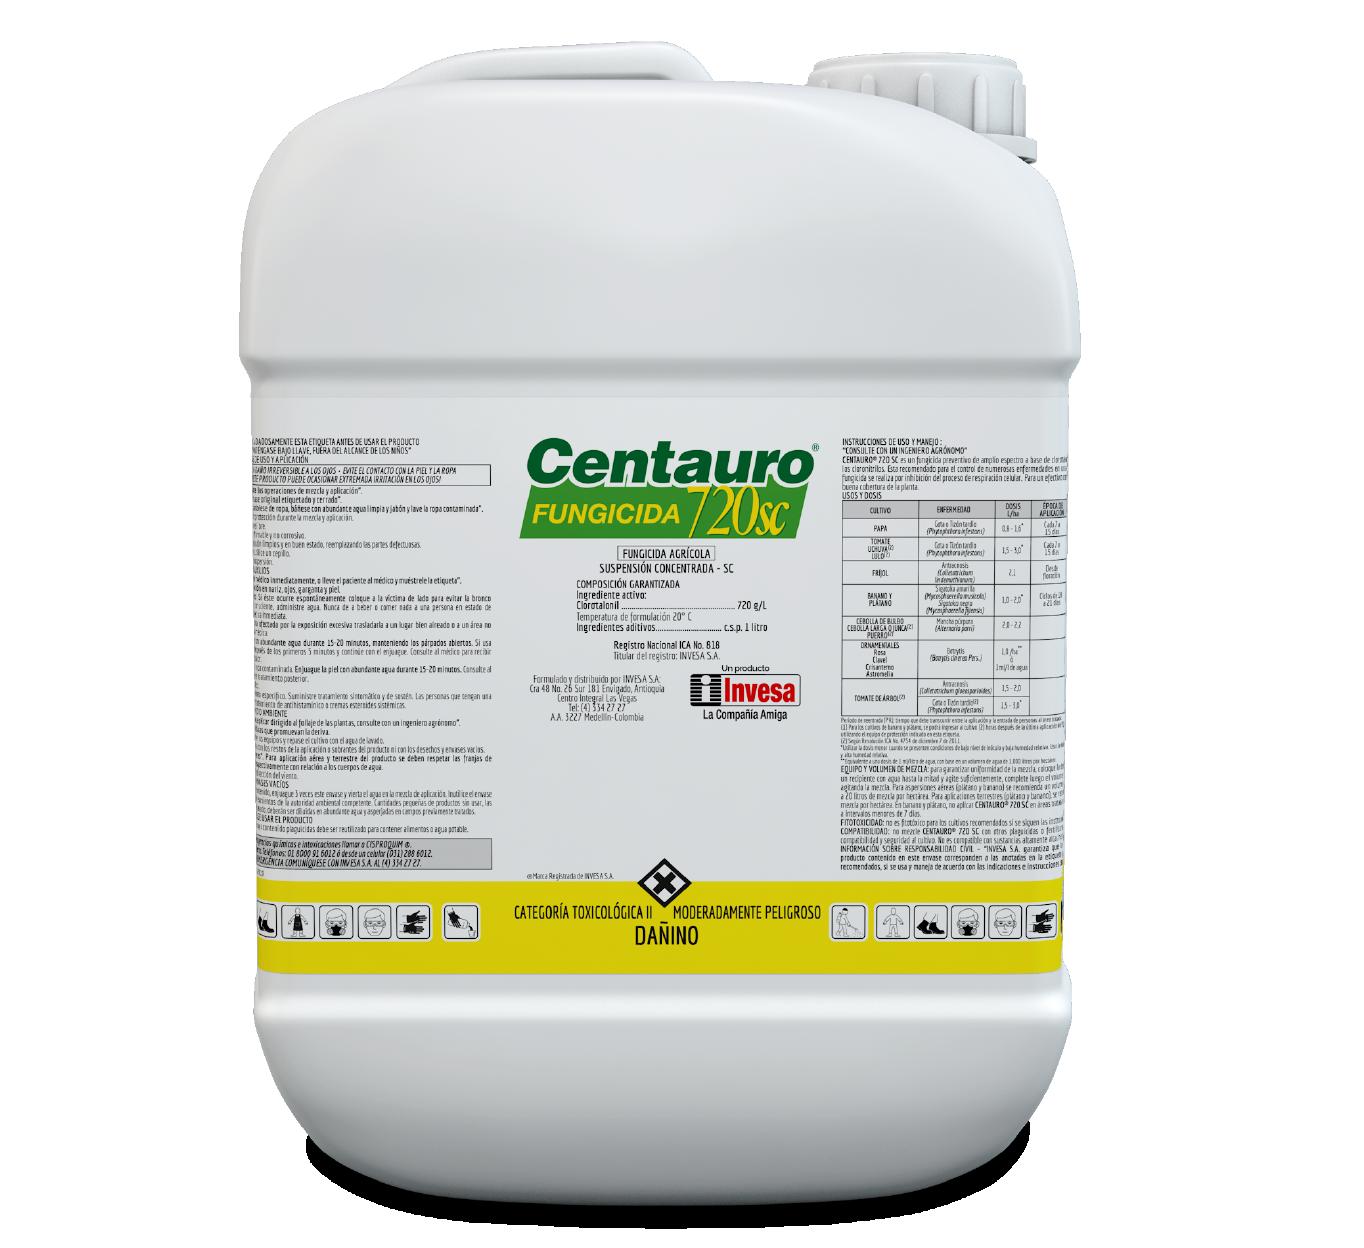 Fungicida centauro 720 sc invesa 10 litros